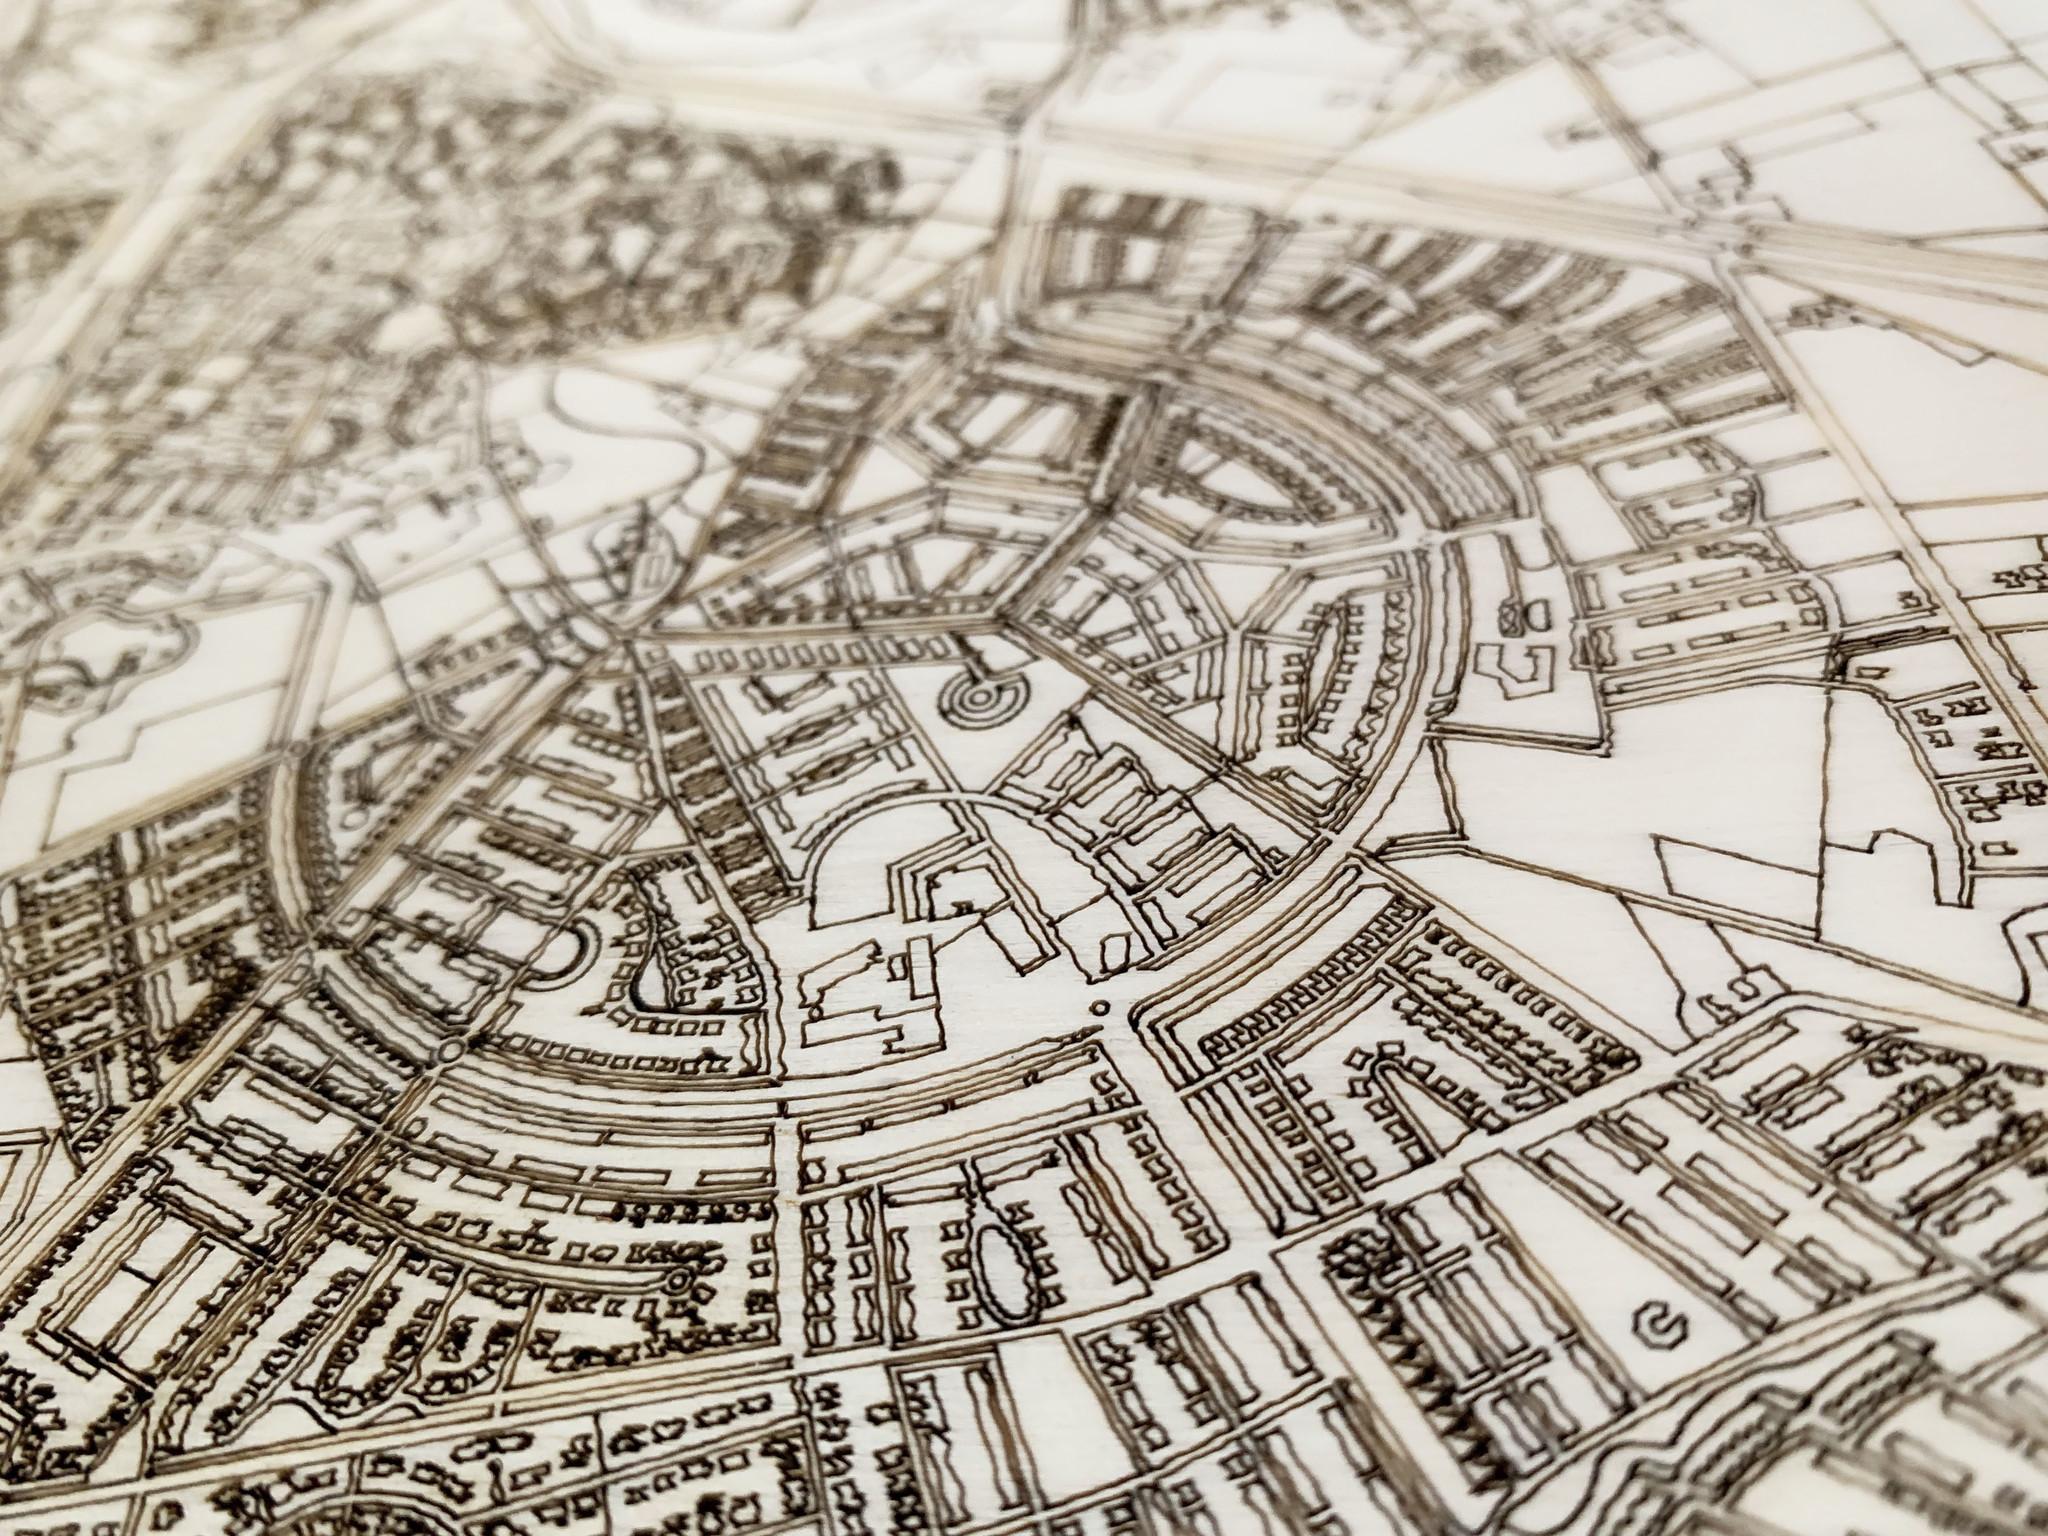 Houten stadsplattegrond Kerkrade-4